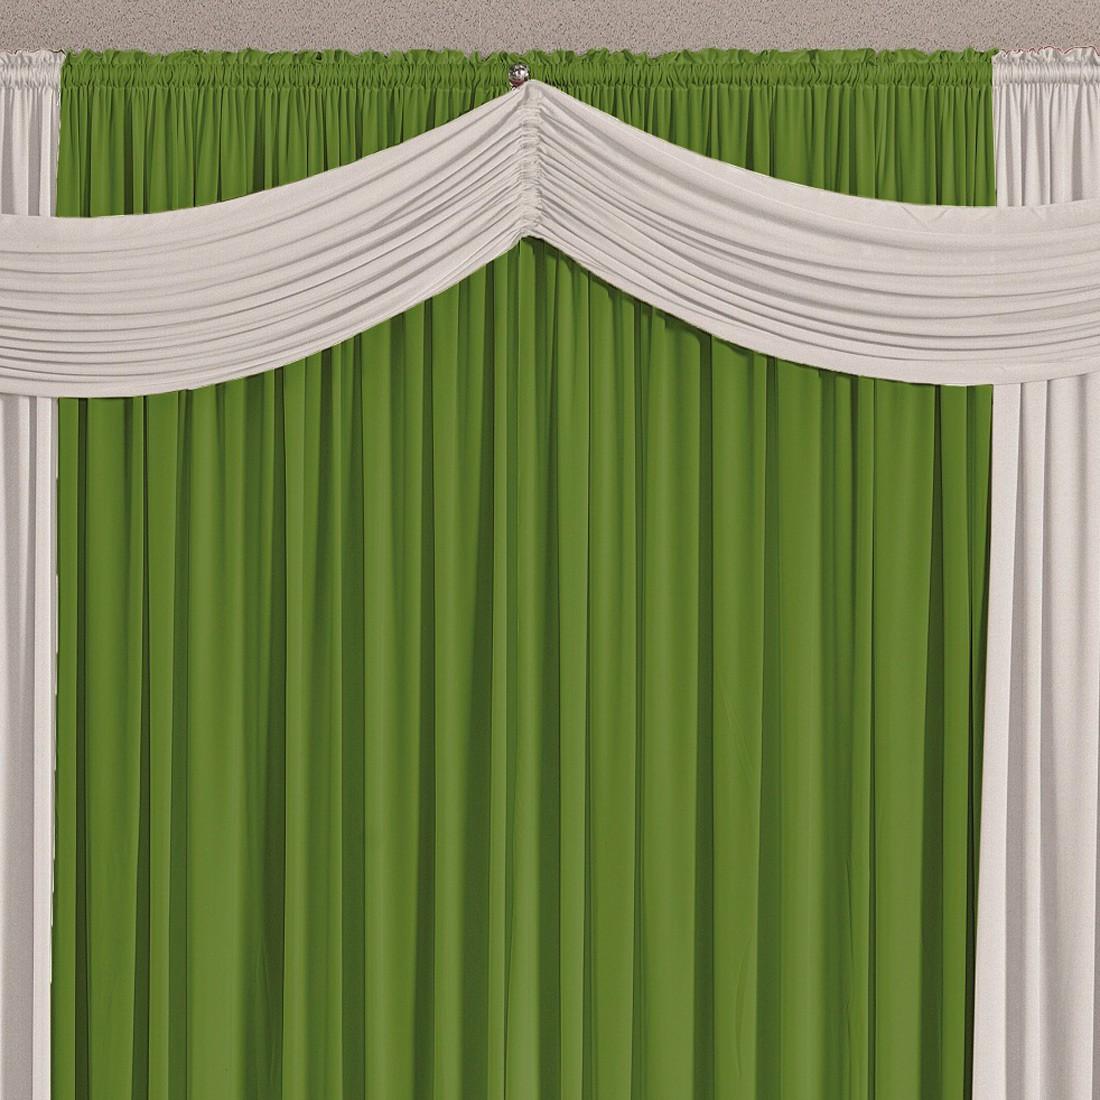 Cortina Versatty Verde/Branco 3,00m X 2,60m p/ Varão Simples